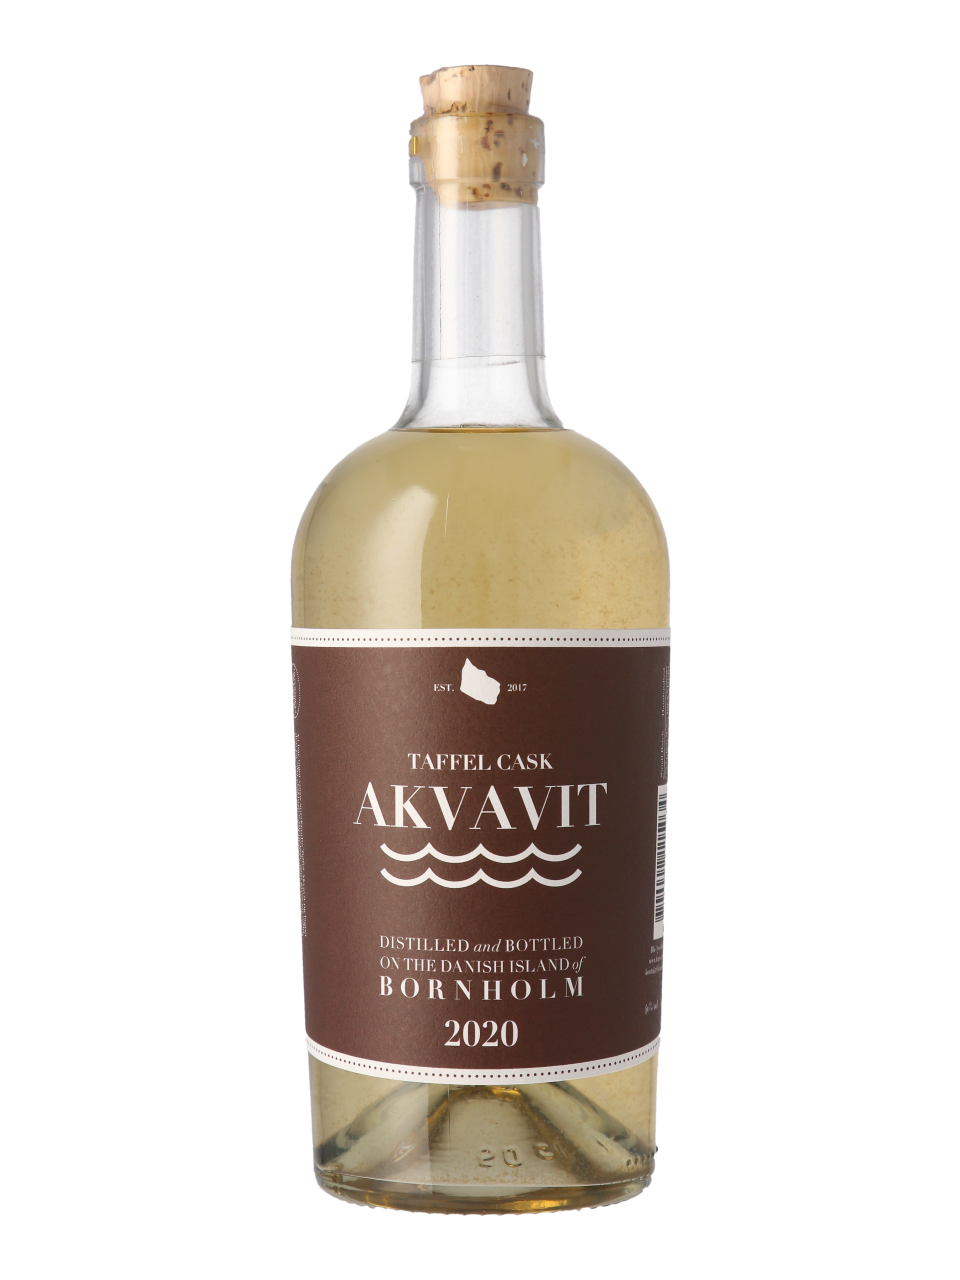 Taffel Cask Akvavit